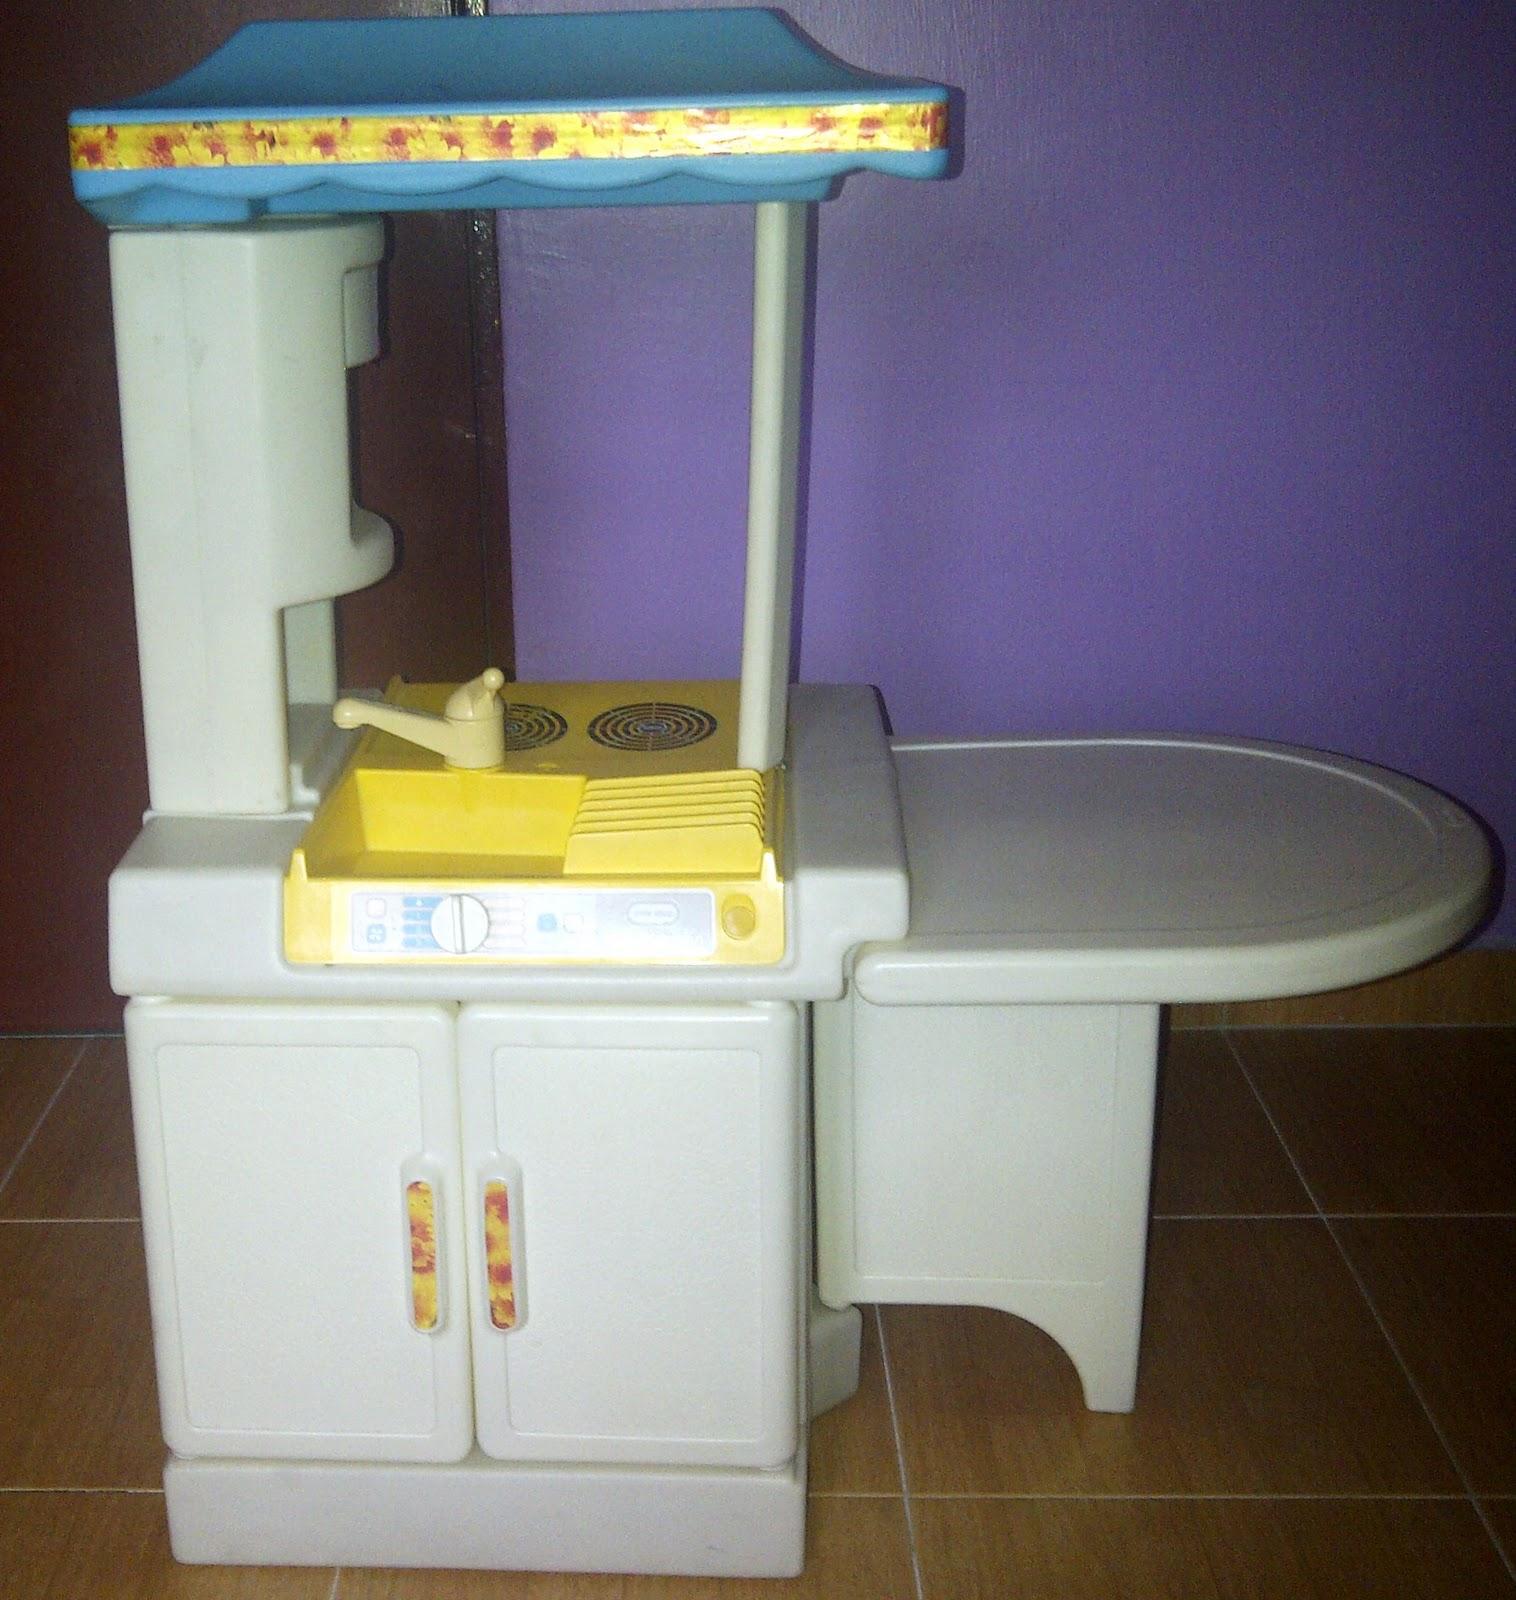 Little Tyke Kitchen Set: SPECIAL TOYS SHOP: LITTLE TIKES KITCHEN